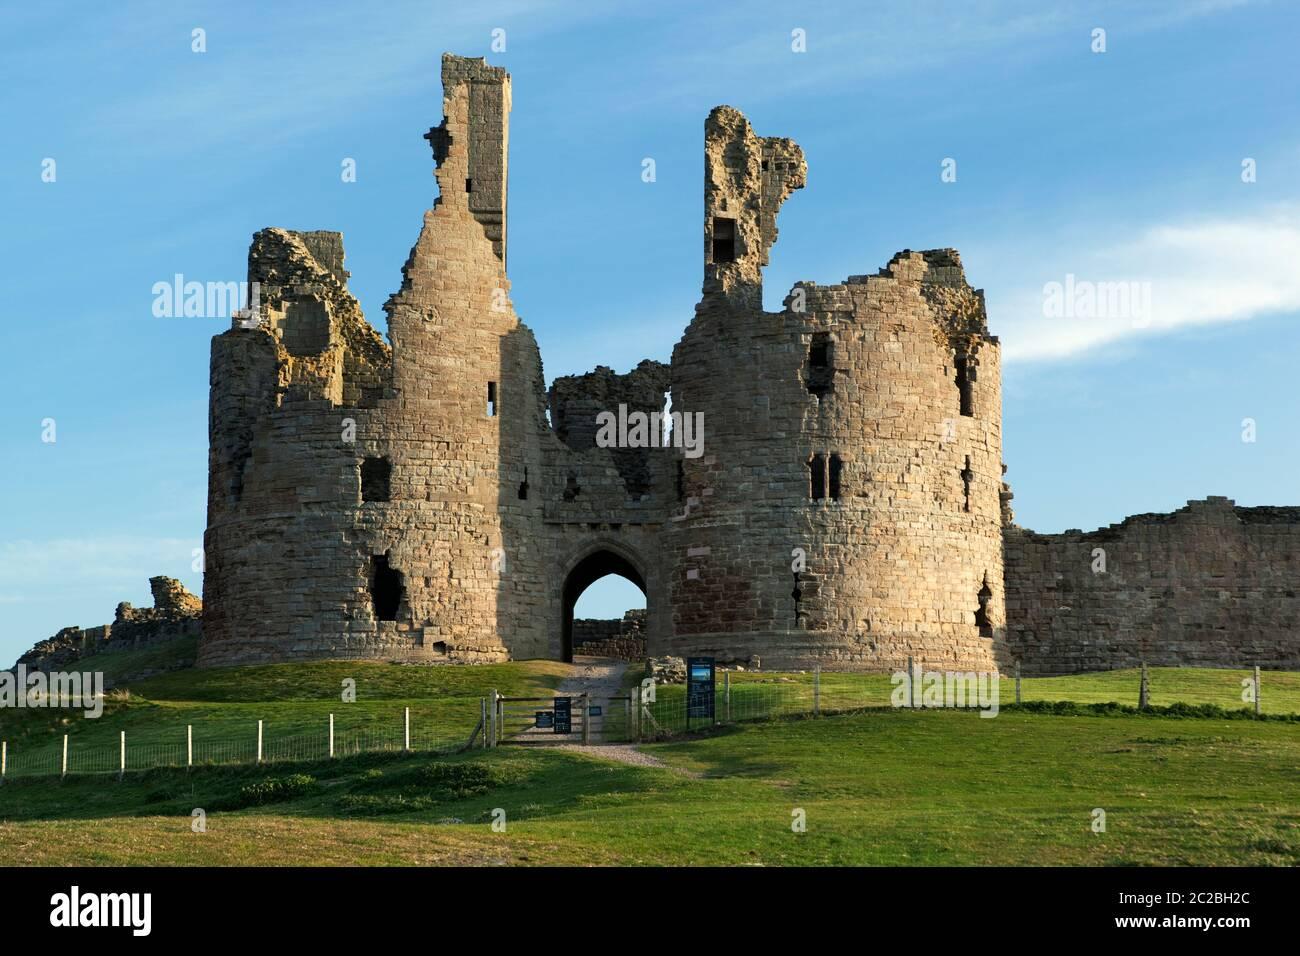 Ruins of medieval Dunstanburgh Castle, Alnwick, Northumberland, England, United Kingdom, Europe Stock Photo